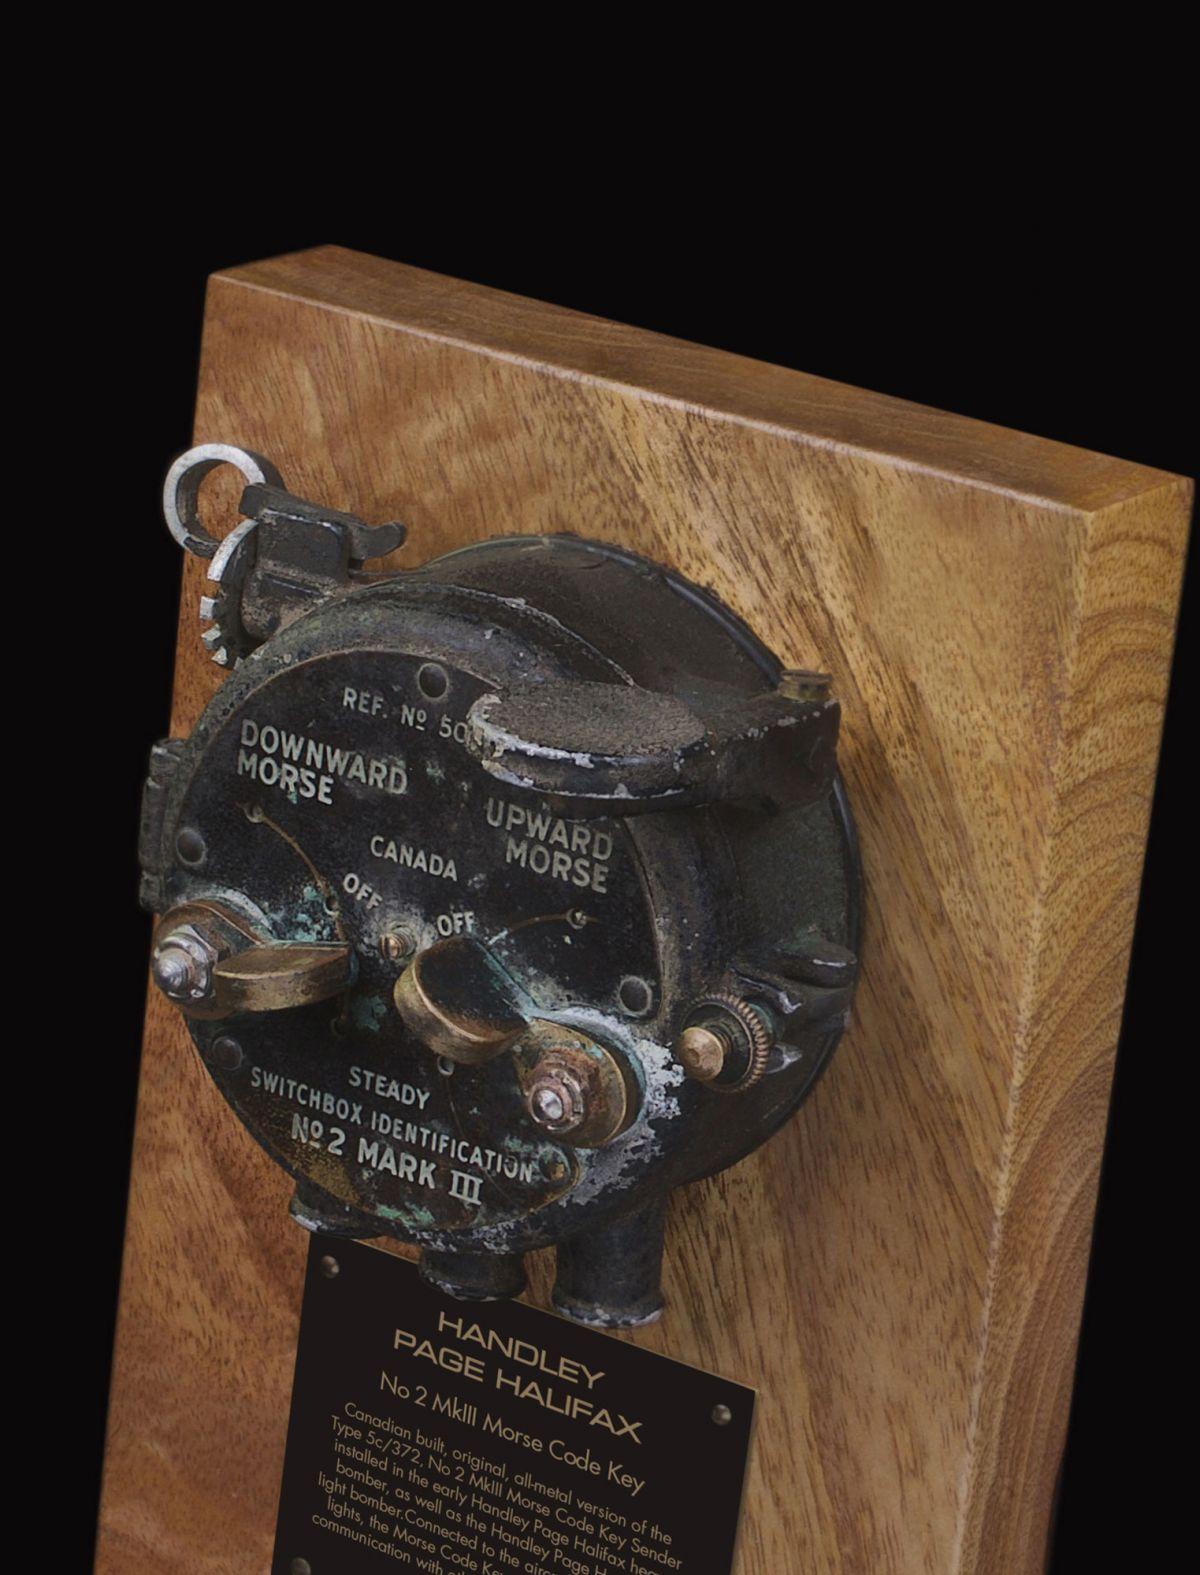 HANDLEY PAGE HALIFAX Mk1A-V, 5c/372 No.2 Mk III MORSE CODE KEY